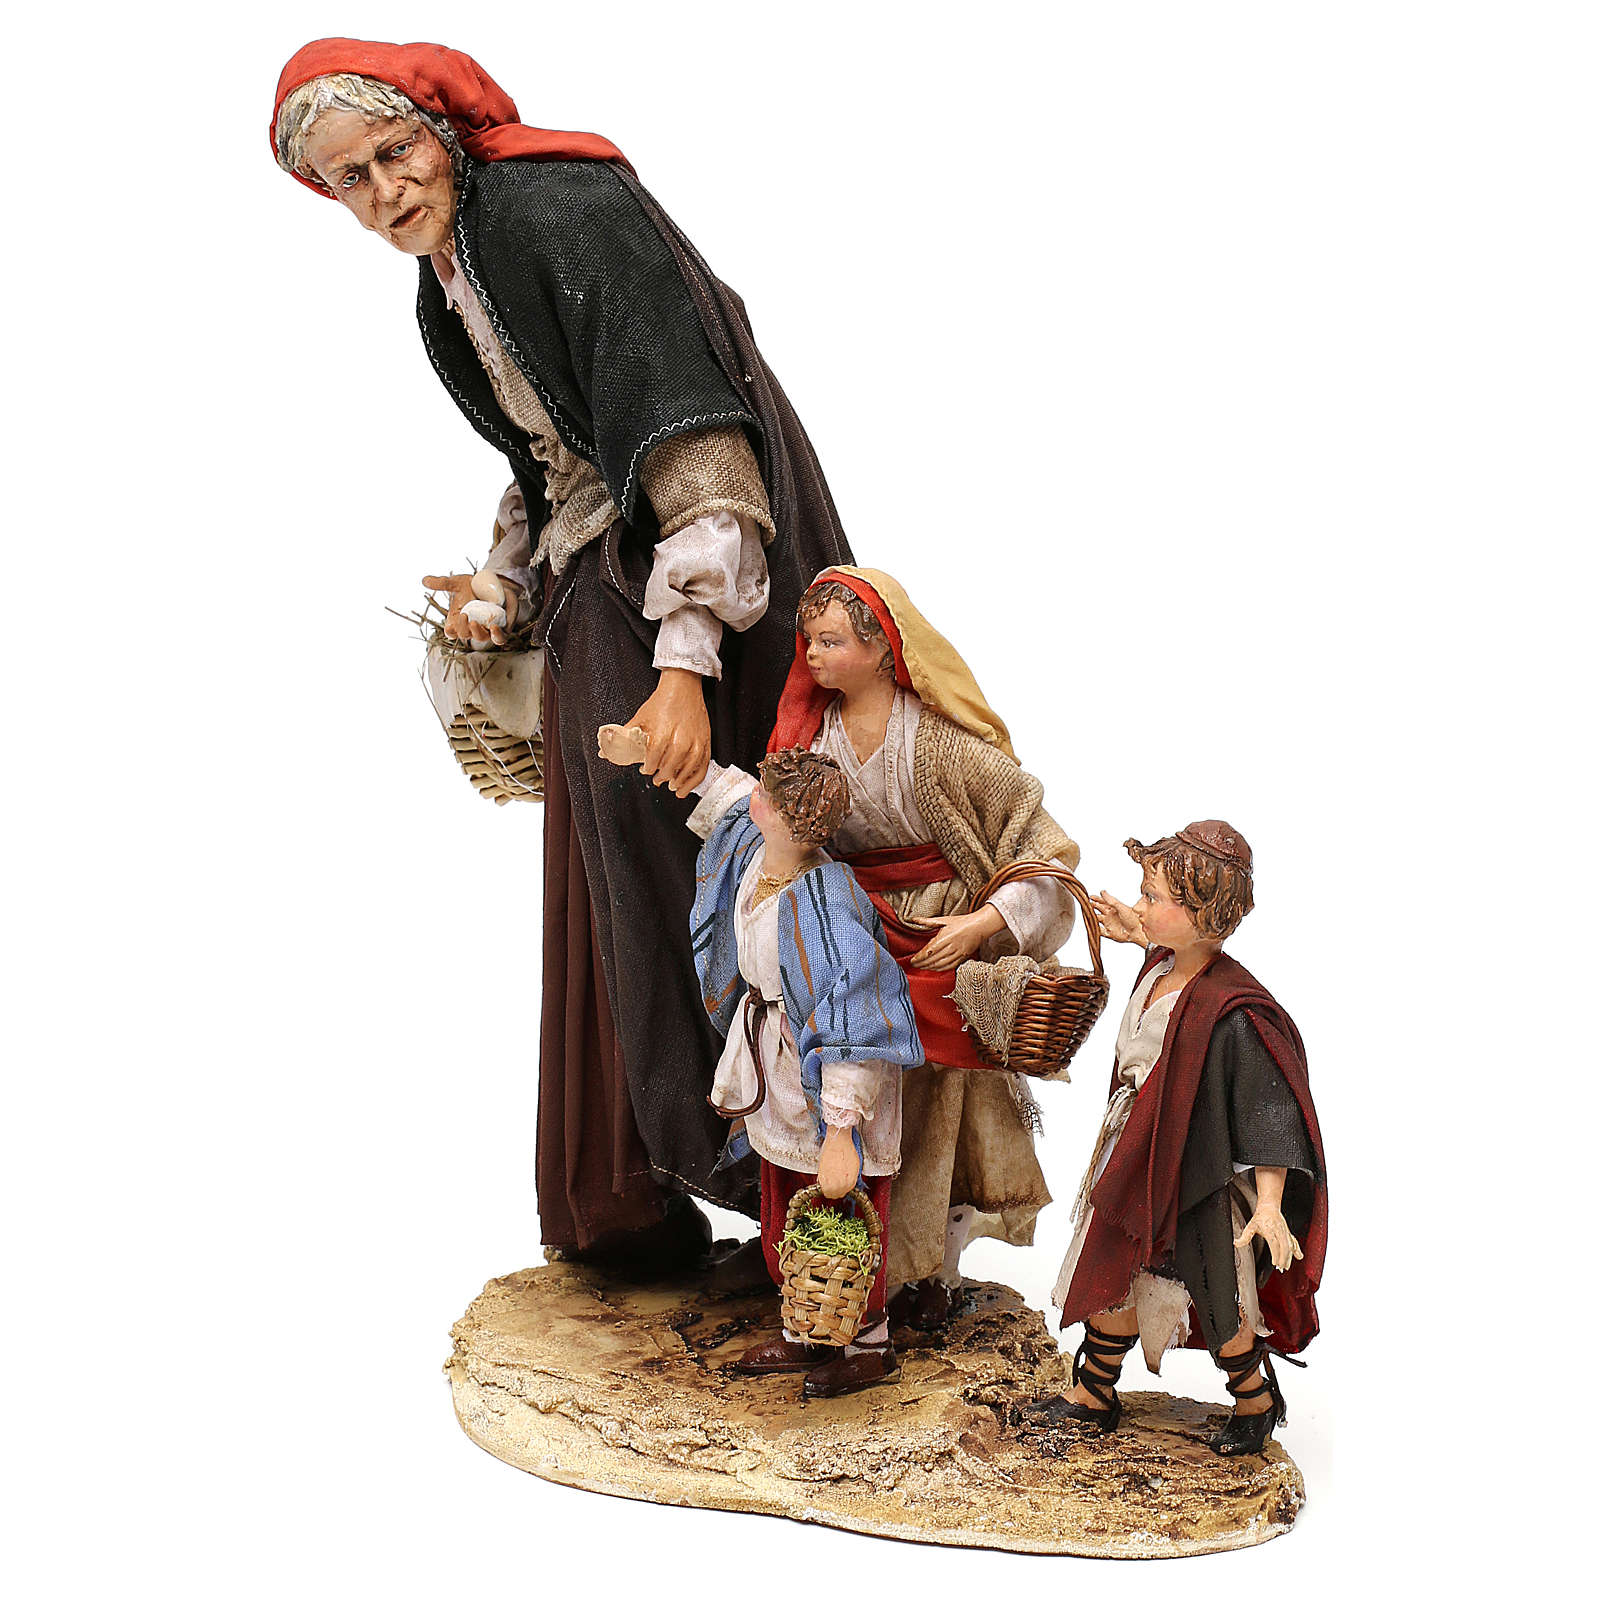 Donna anziana con 3 bambini presepe 30 cm Angela Tripi 4